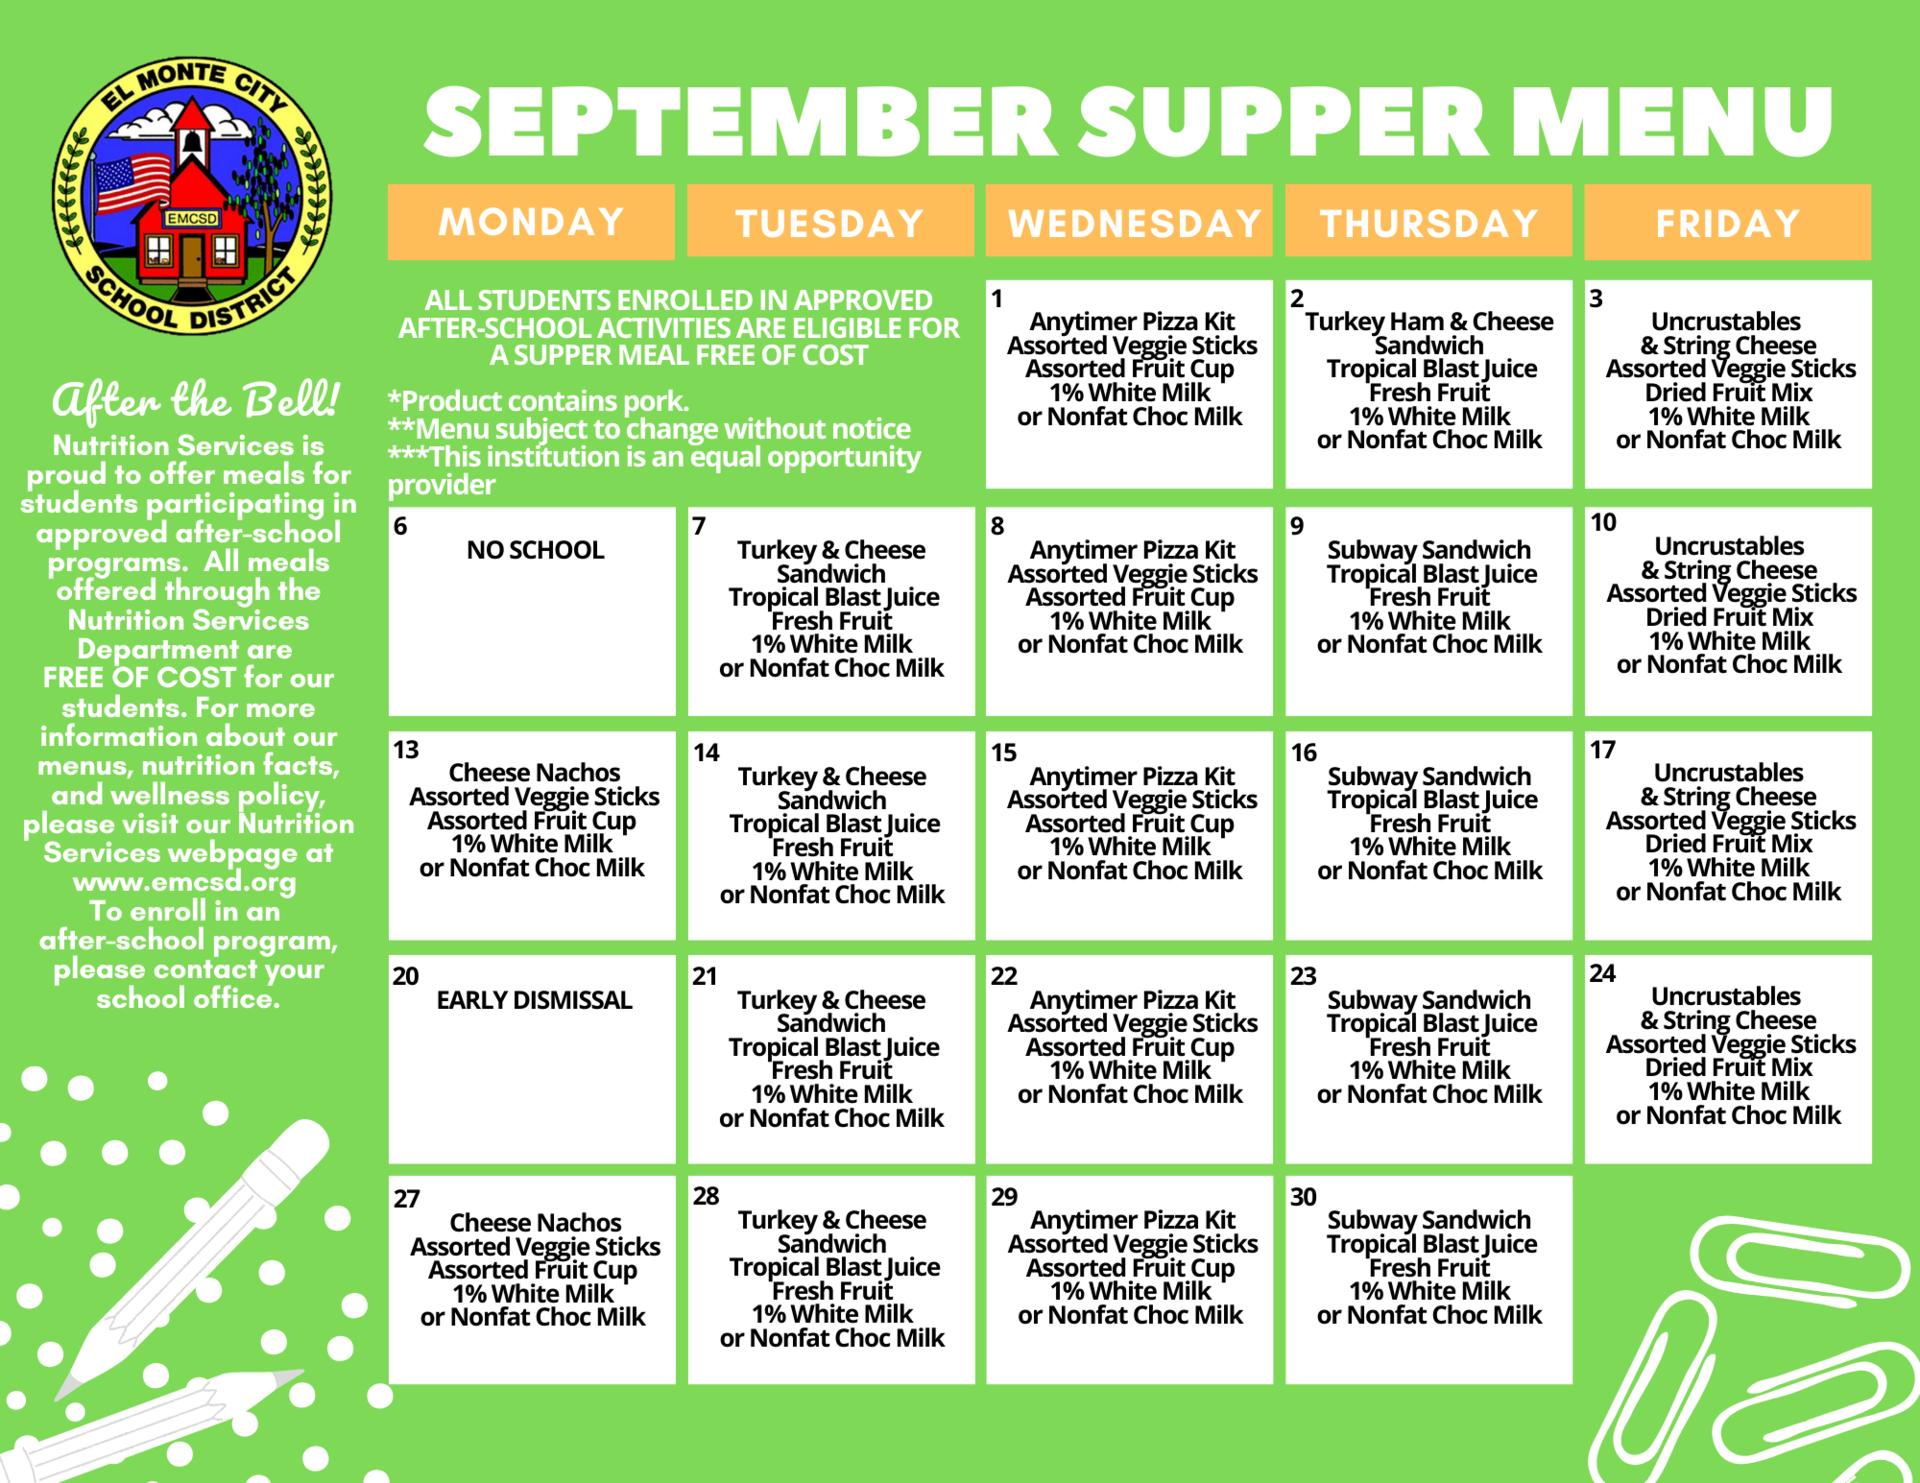 September Supper Menu